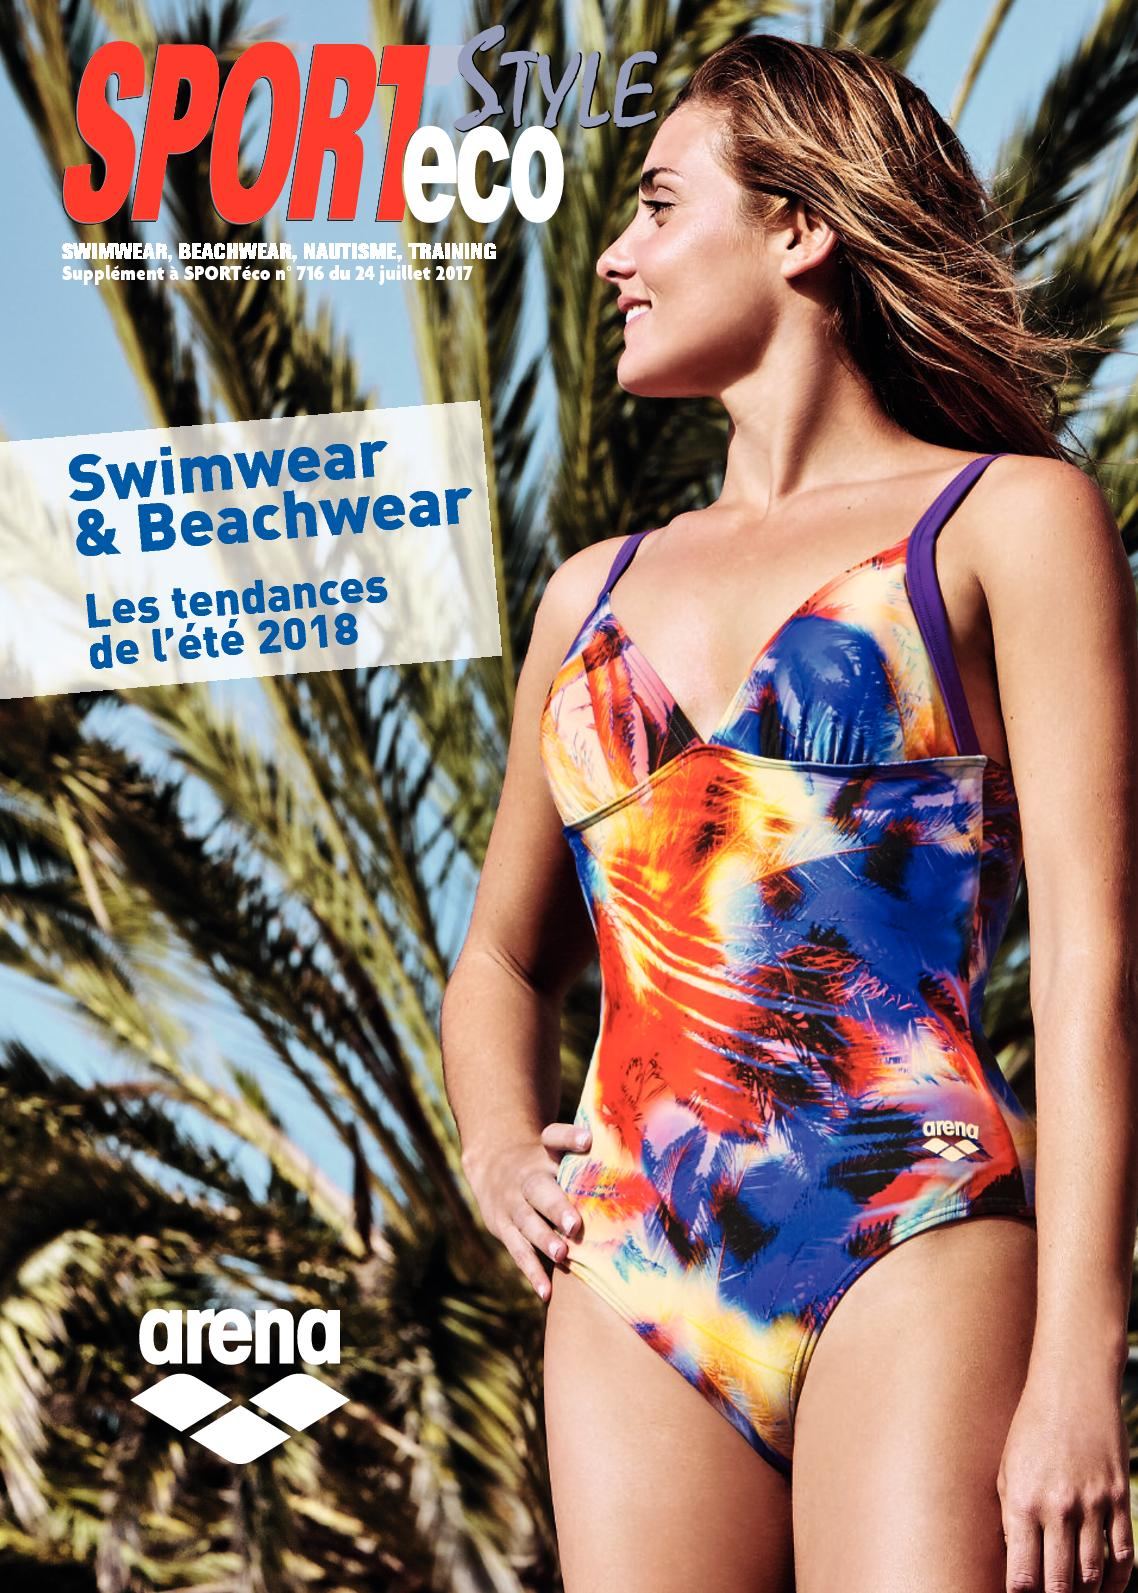 online retailer 19672 3fd32 Calaméo - SPORTéco Style Ete 2017